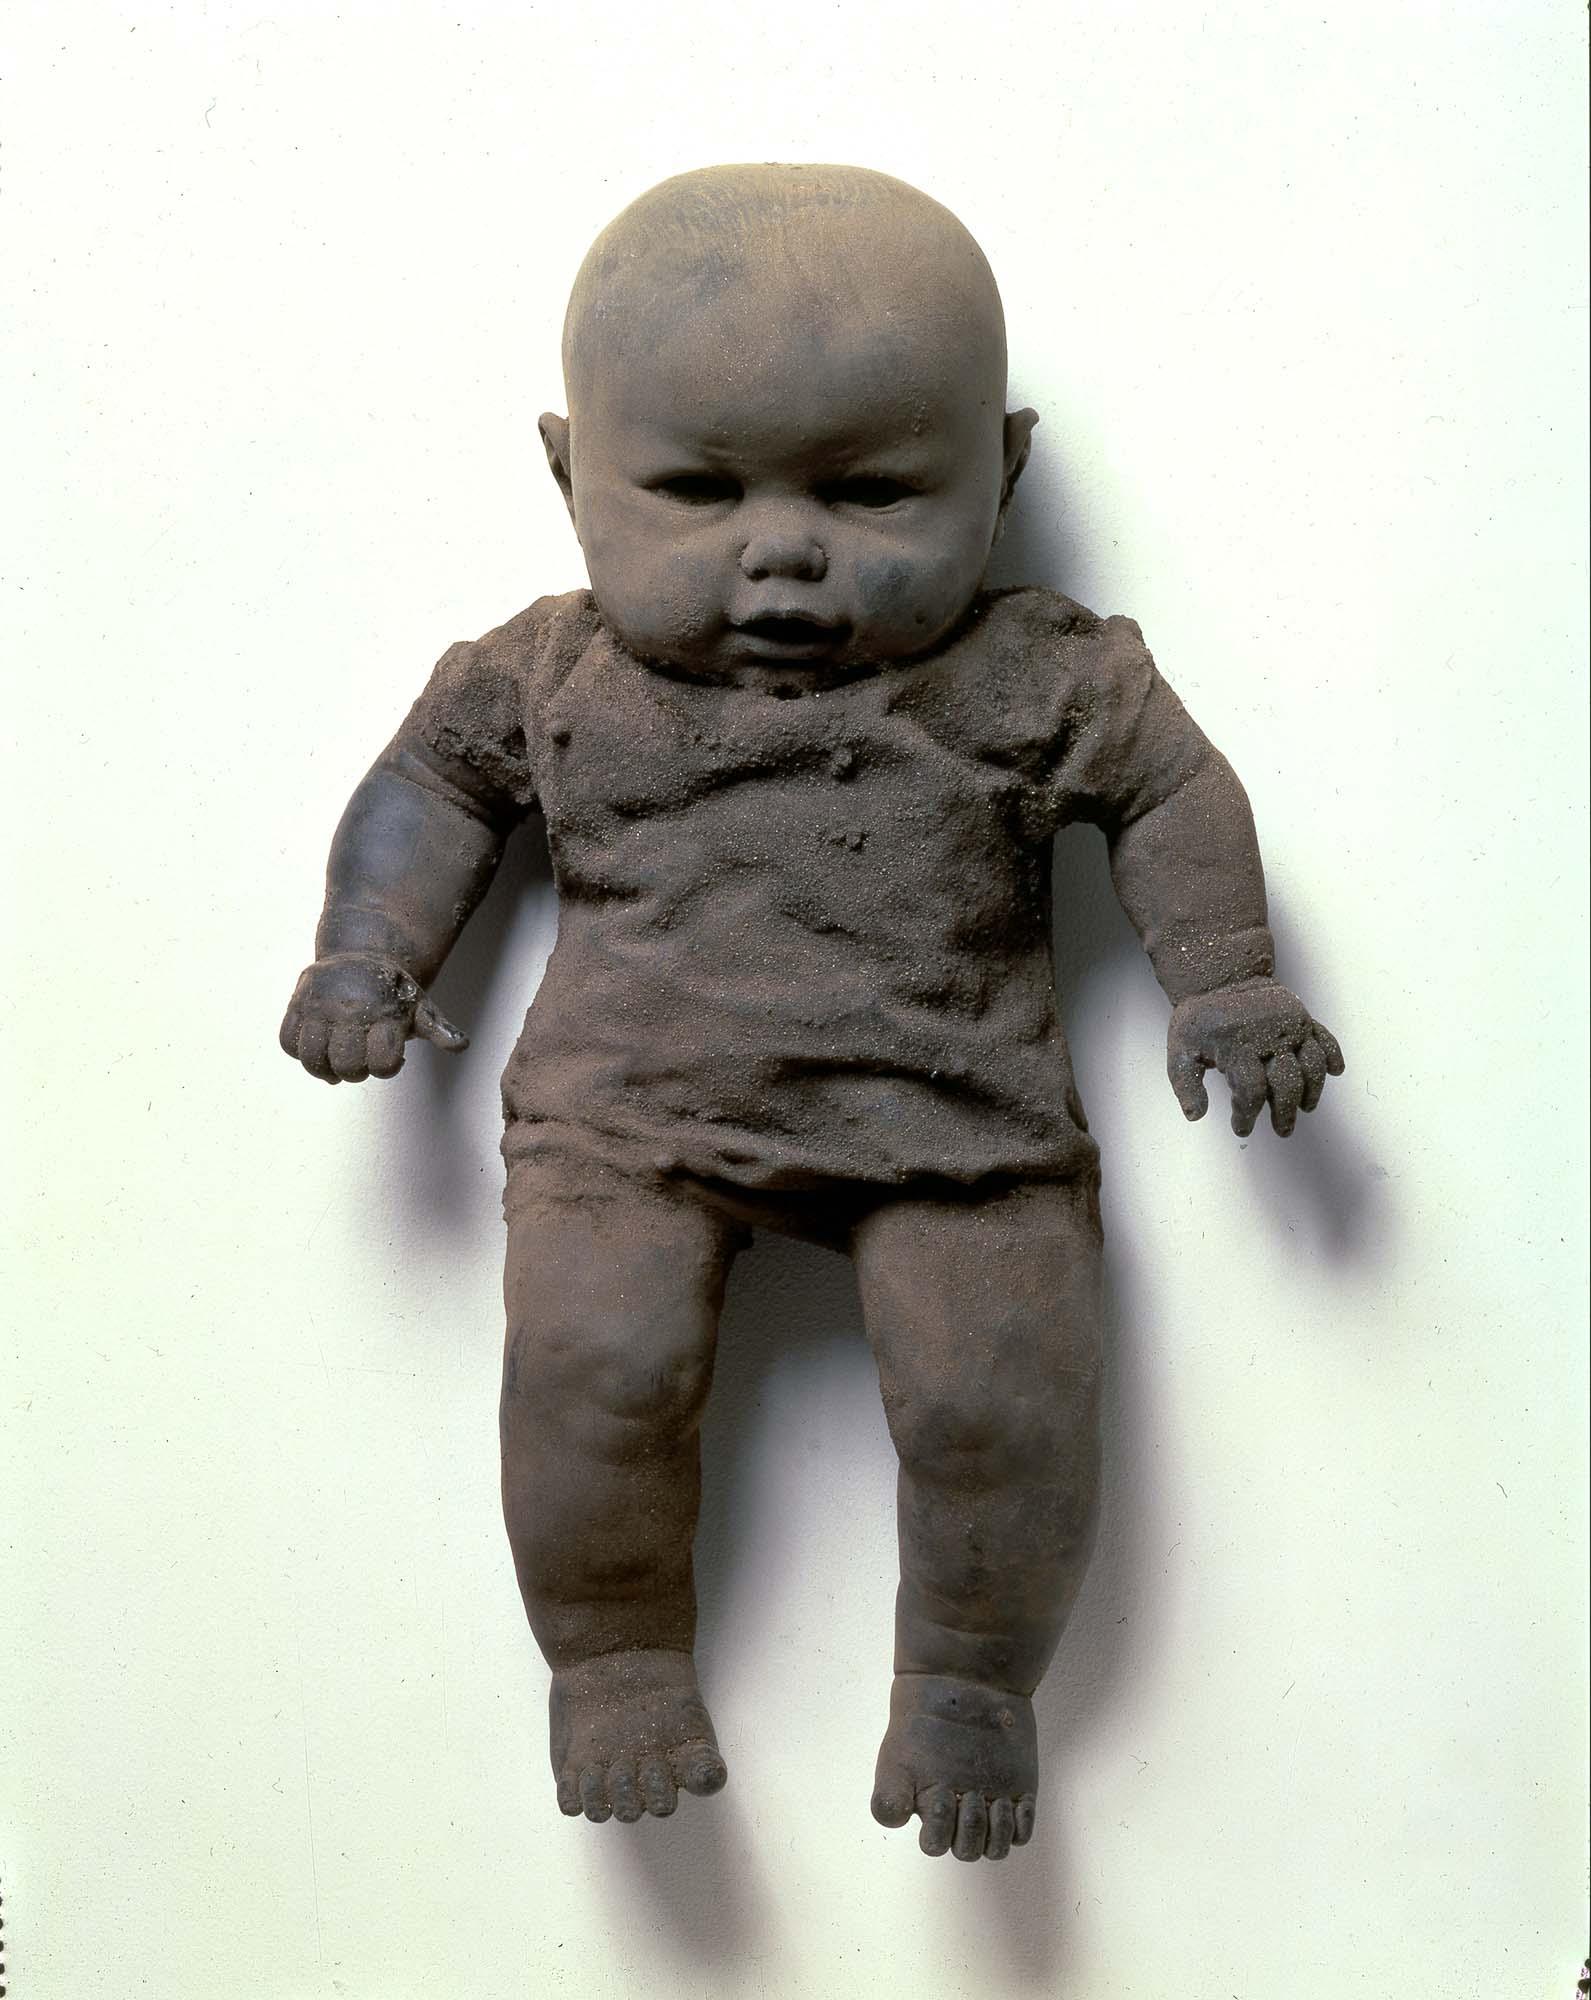 Dirt Baby, 1986.